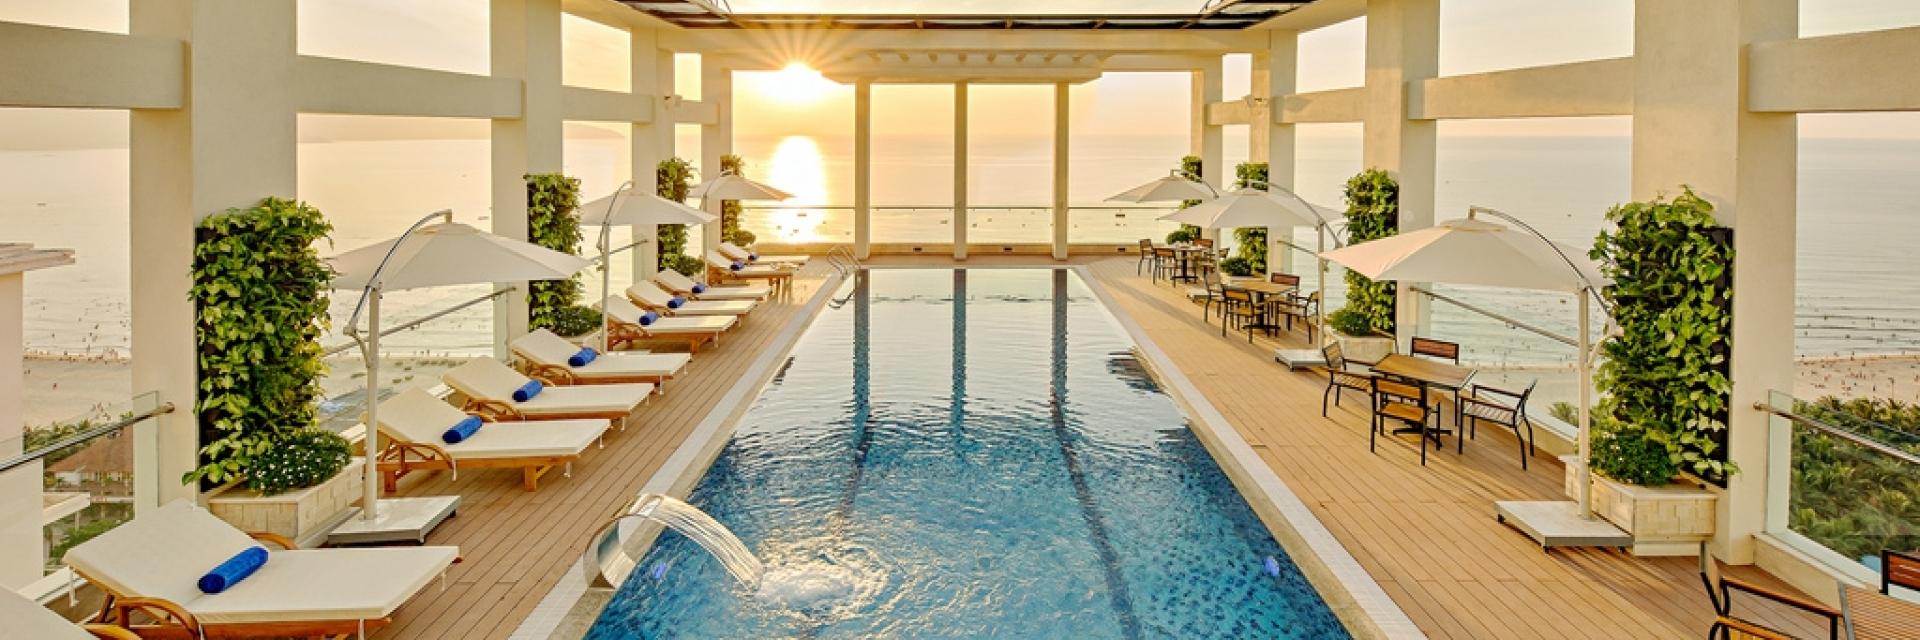 https://gody.vn/blog/nhu.bach7672/post/tan-huong-ki-nghi-quyen-ru-va-sang-chanh-tai-paris-deli-danang-beach-hotel-da-nang-5735